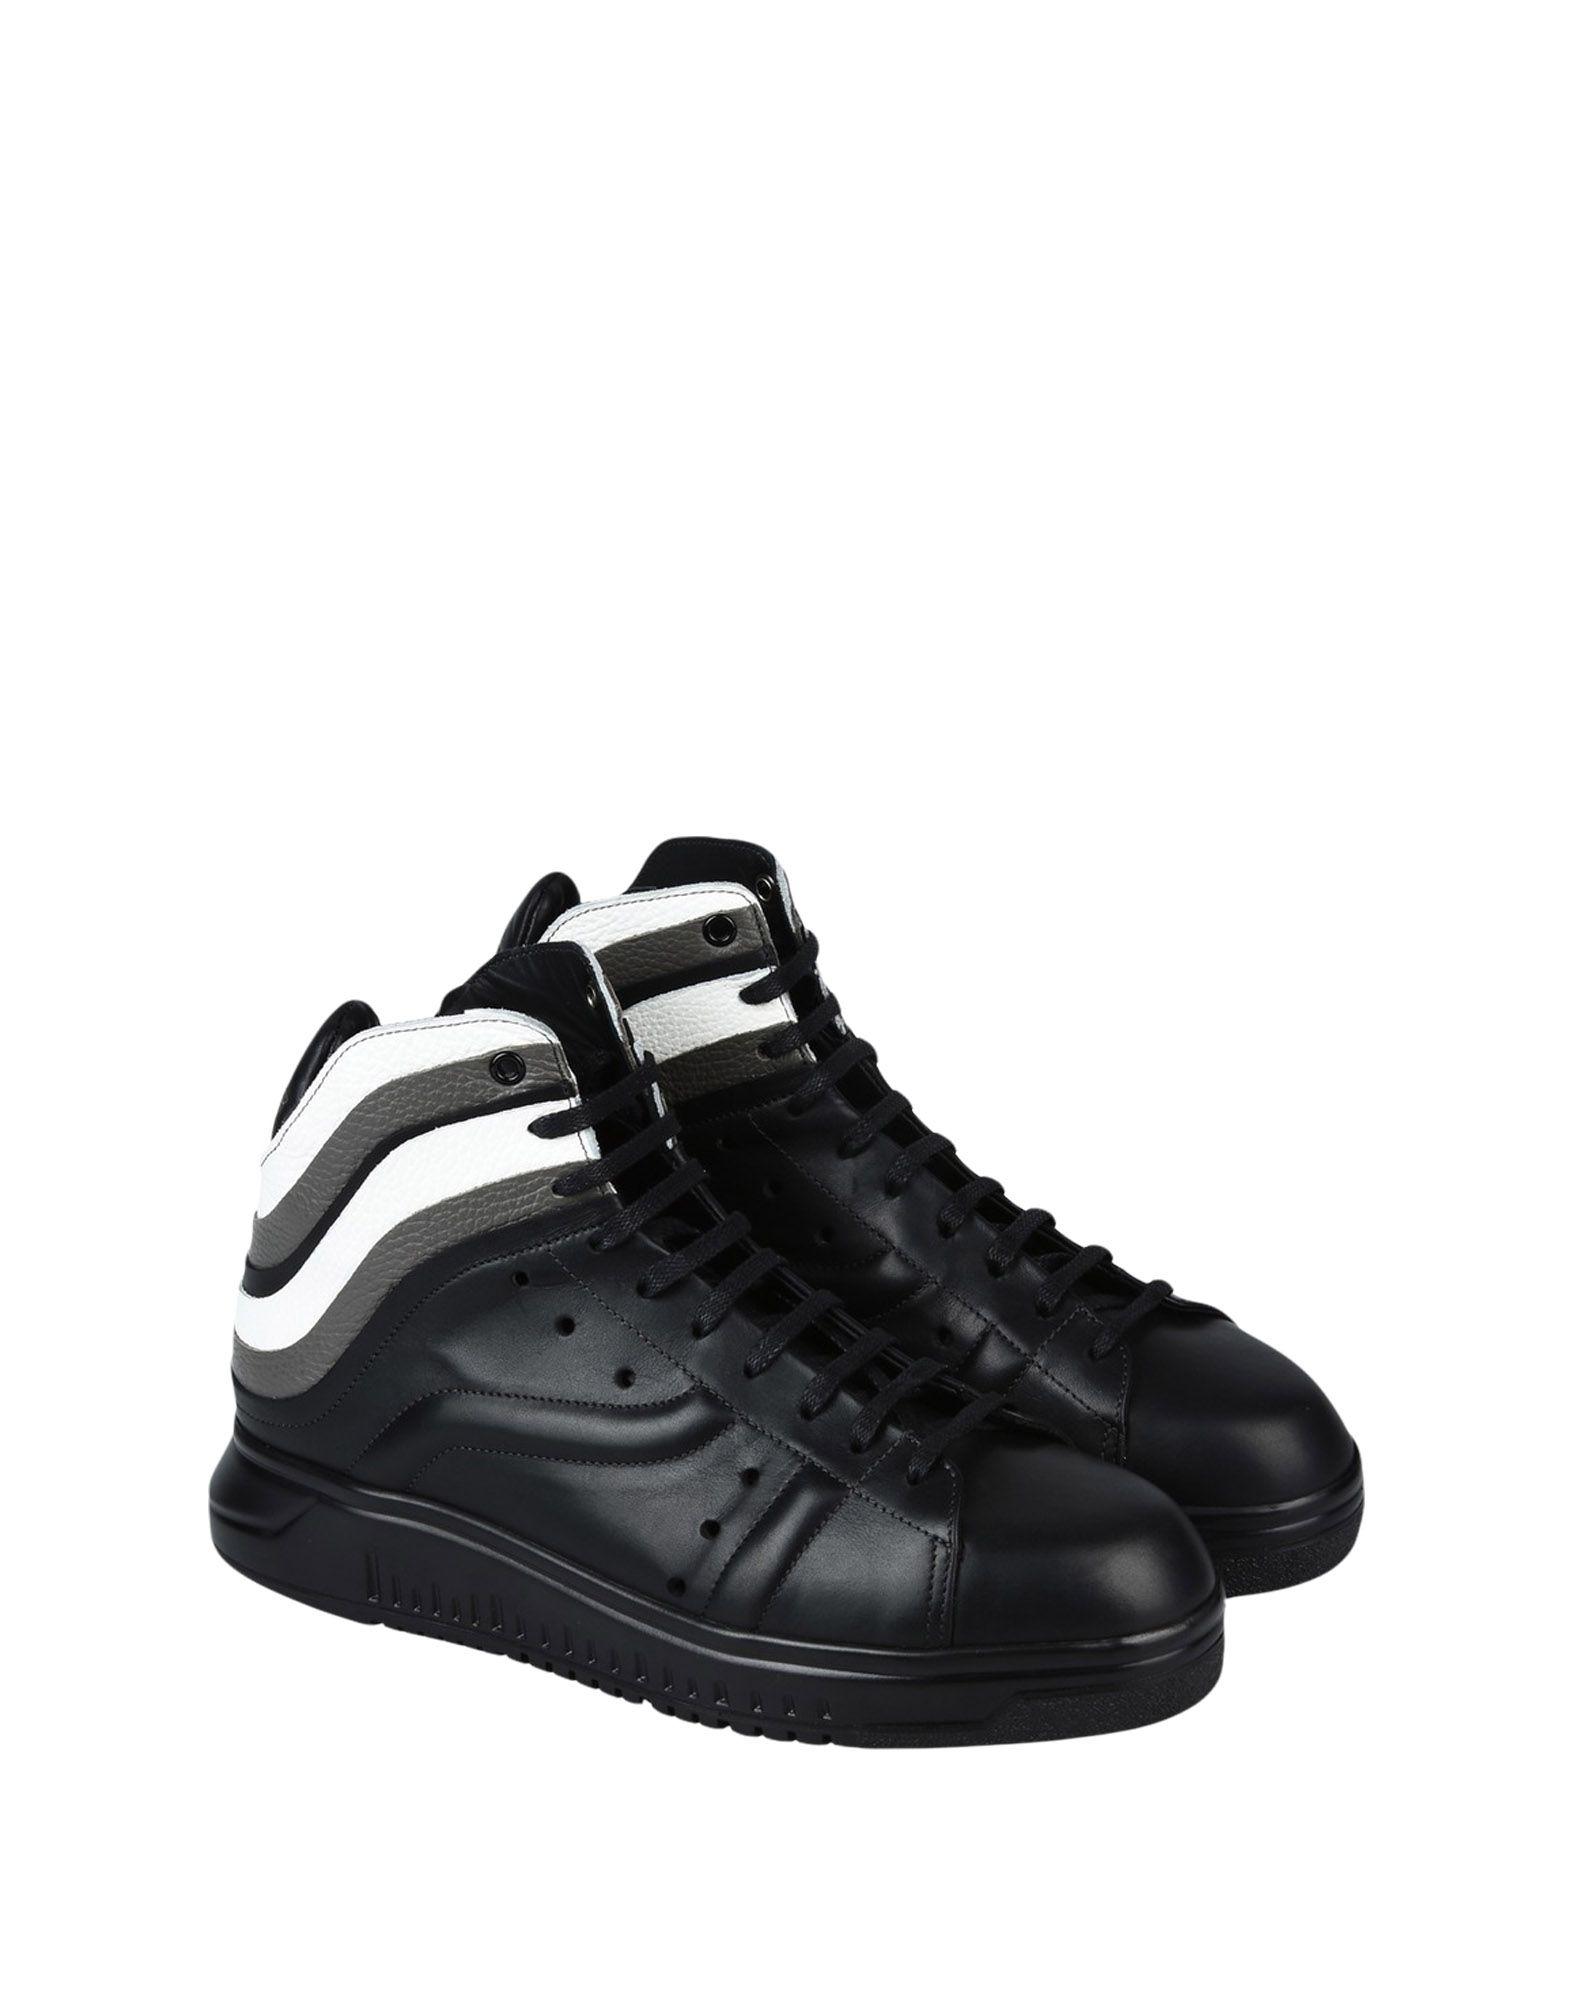 Emporio Armani Sneakers Sneakers Sneakers - Men Emporio Armani Sneakers online on  Canada - 11379797XB ee9823